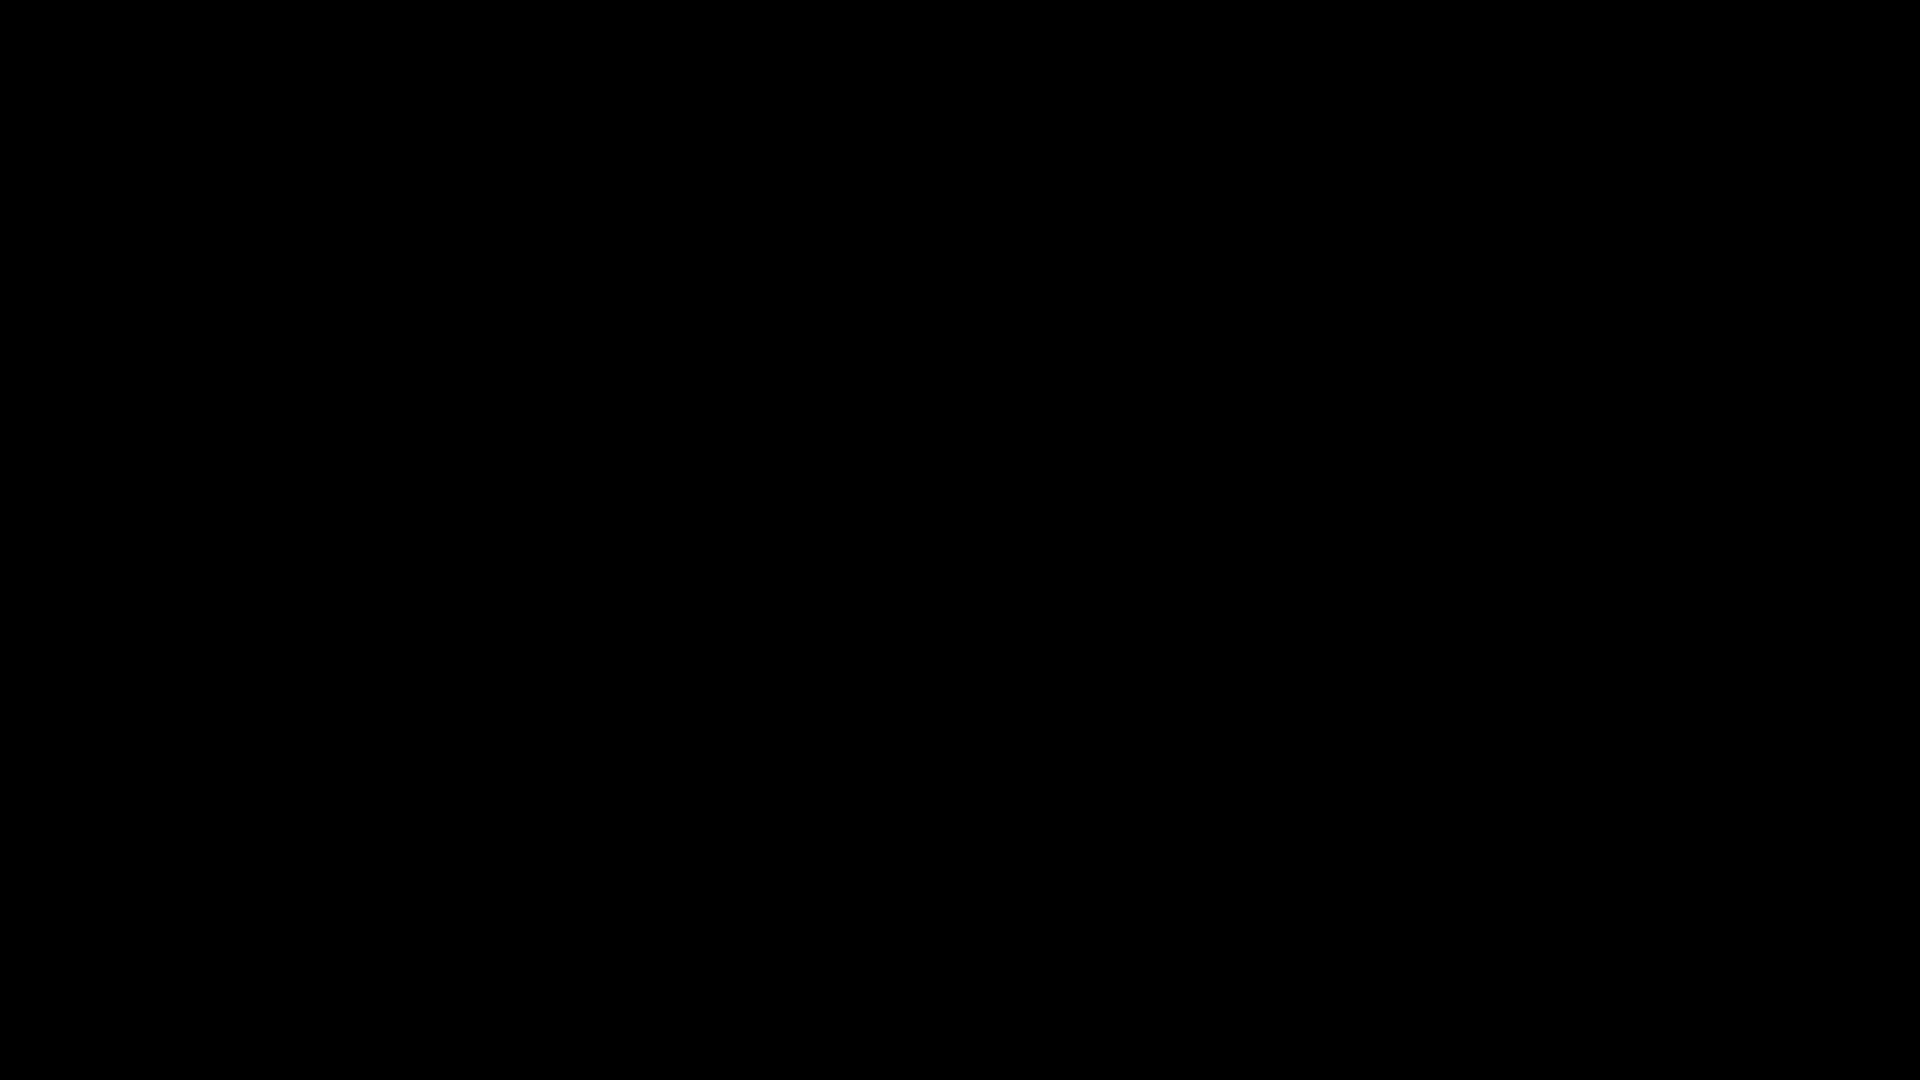 SHOTBYSHE